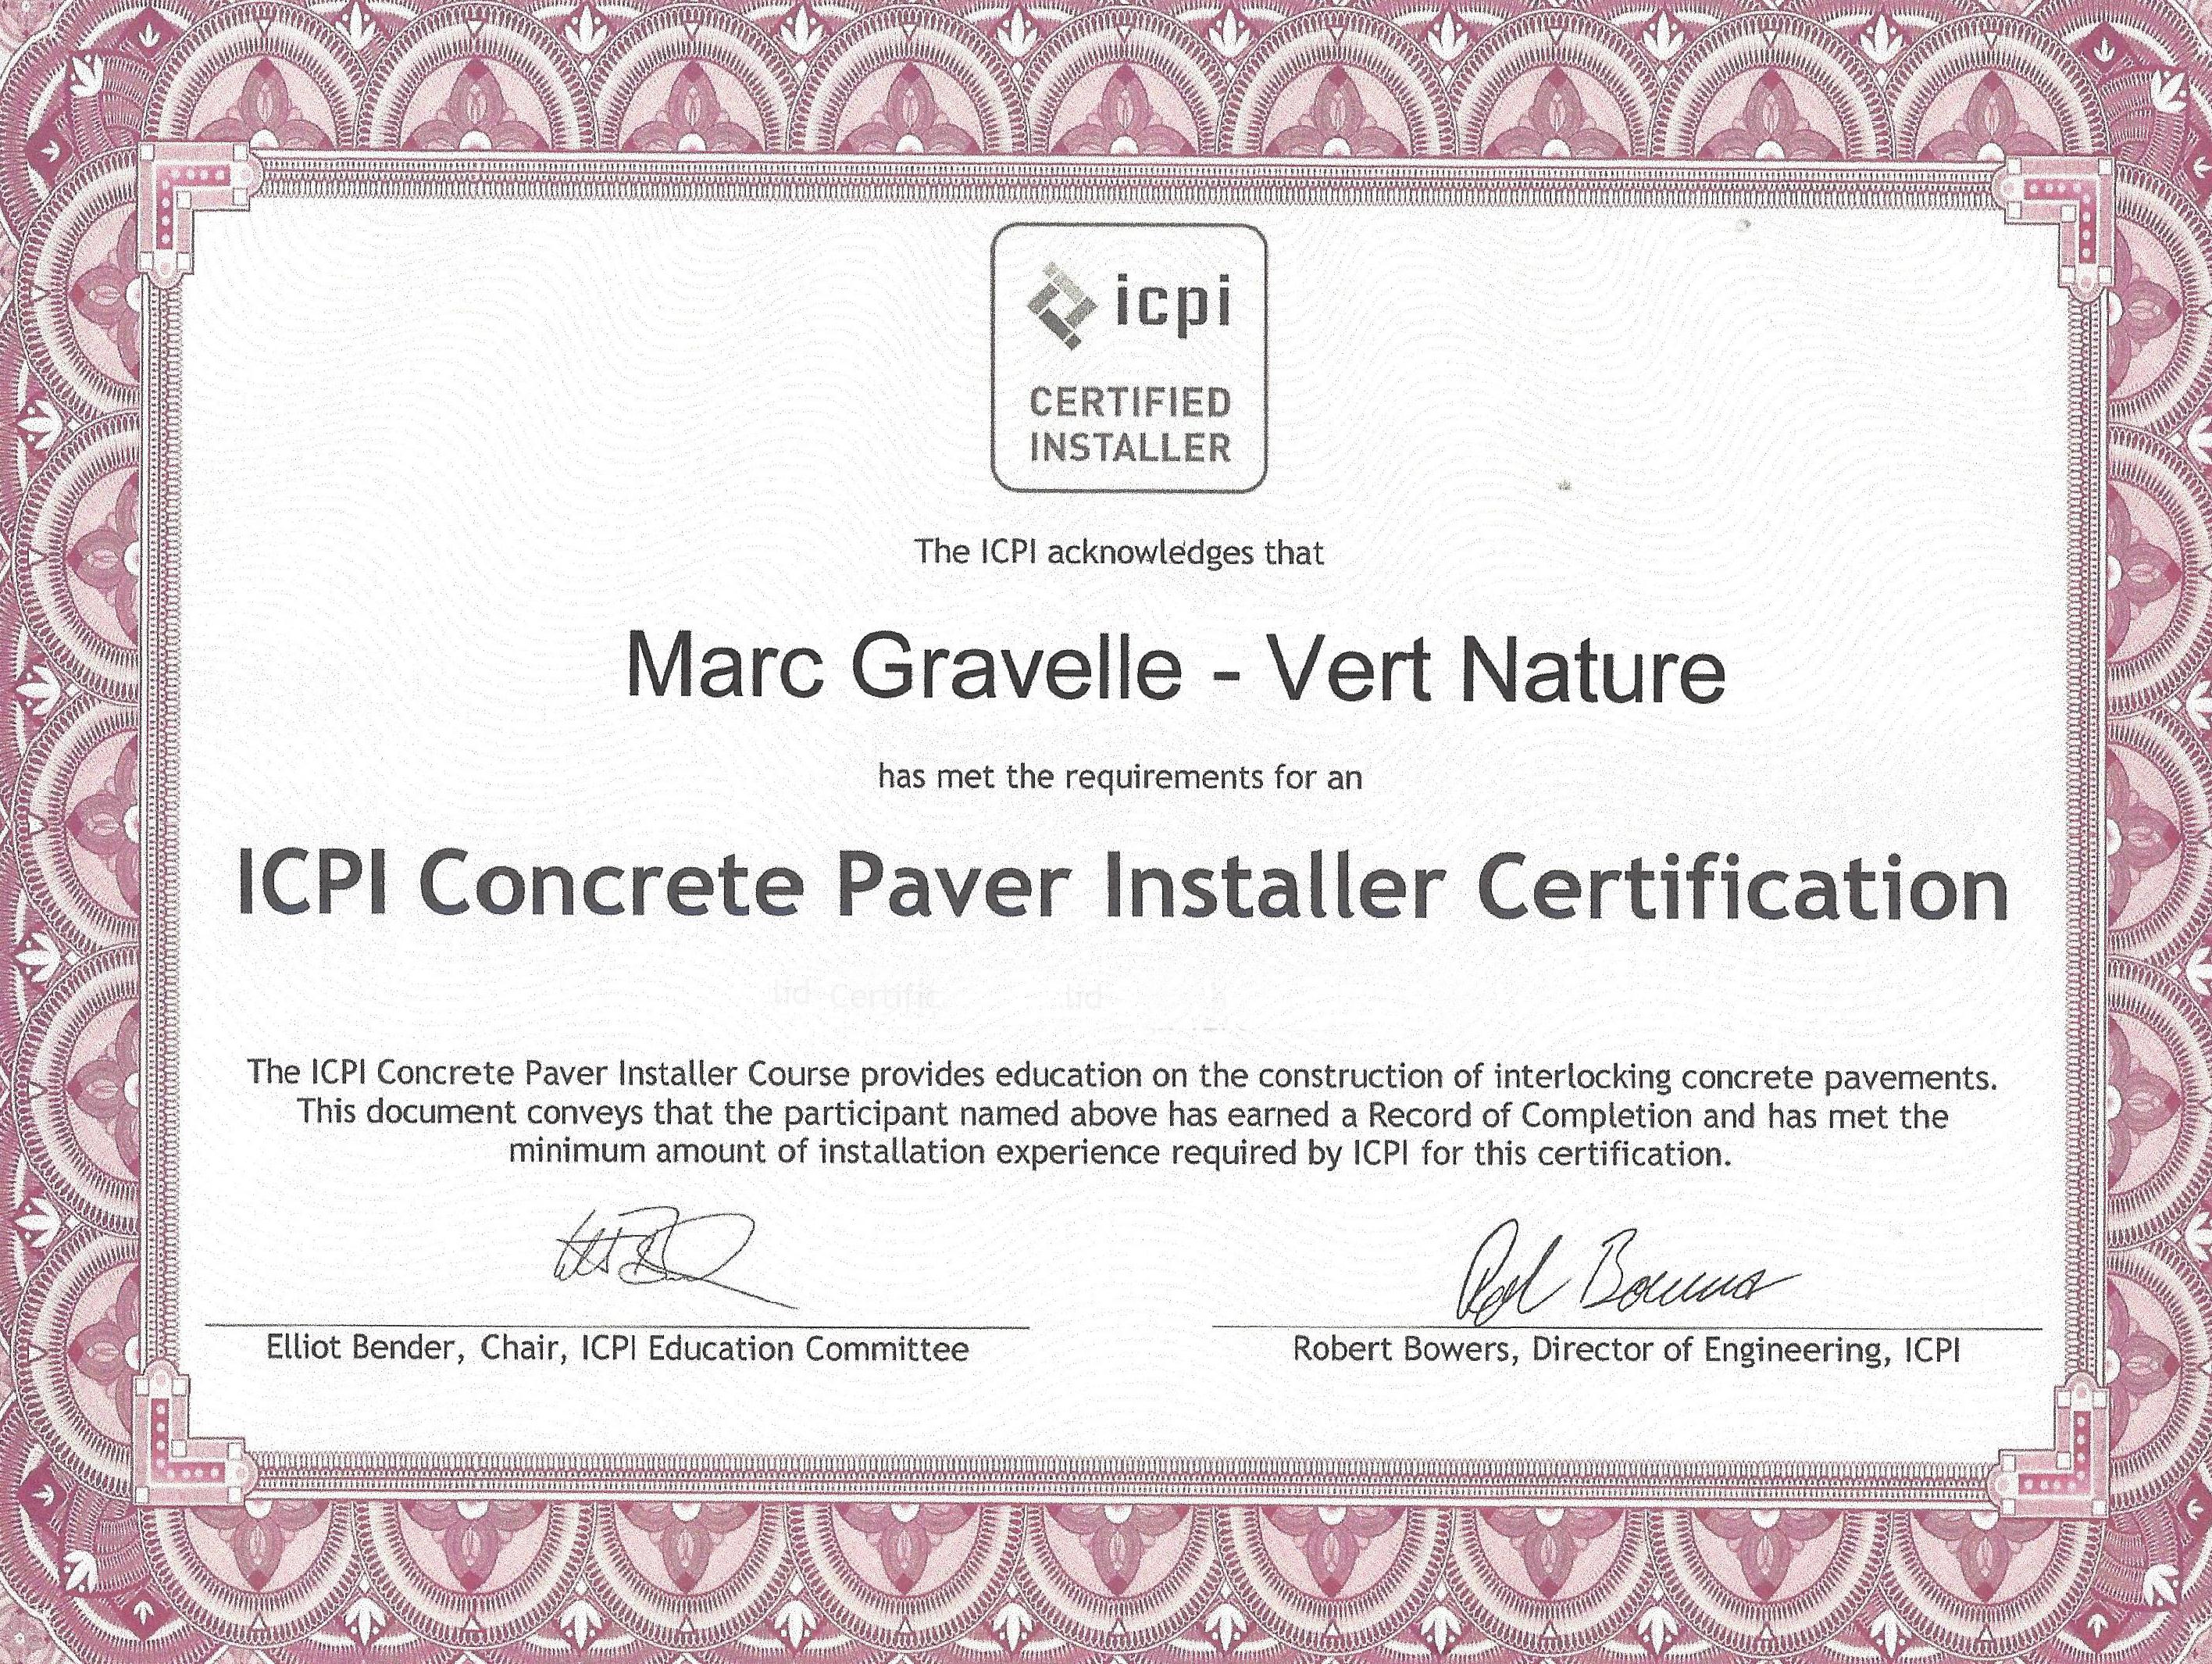 ICPI - Interlock Concrete Paver Installe